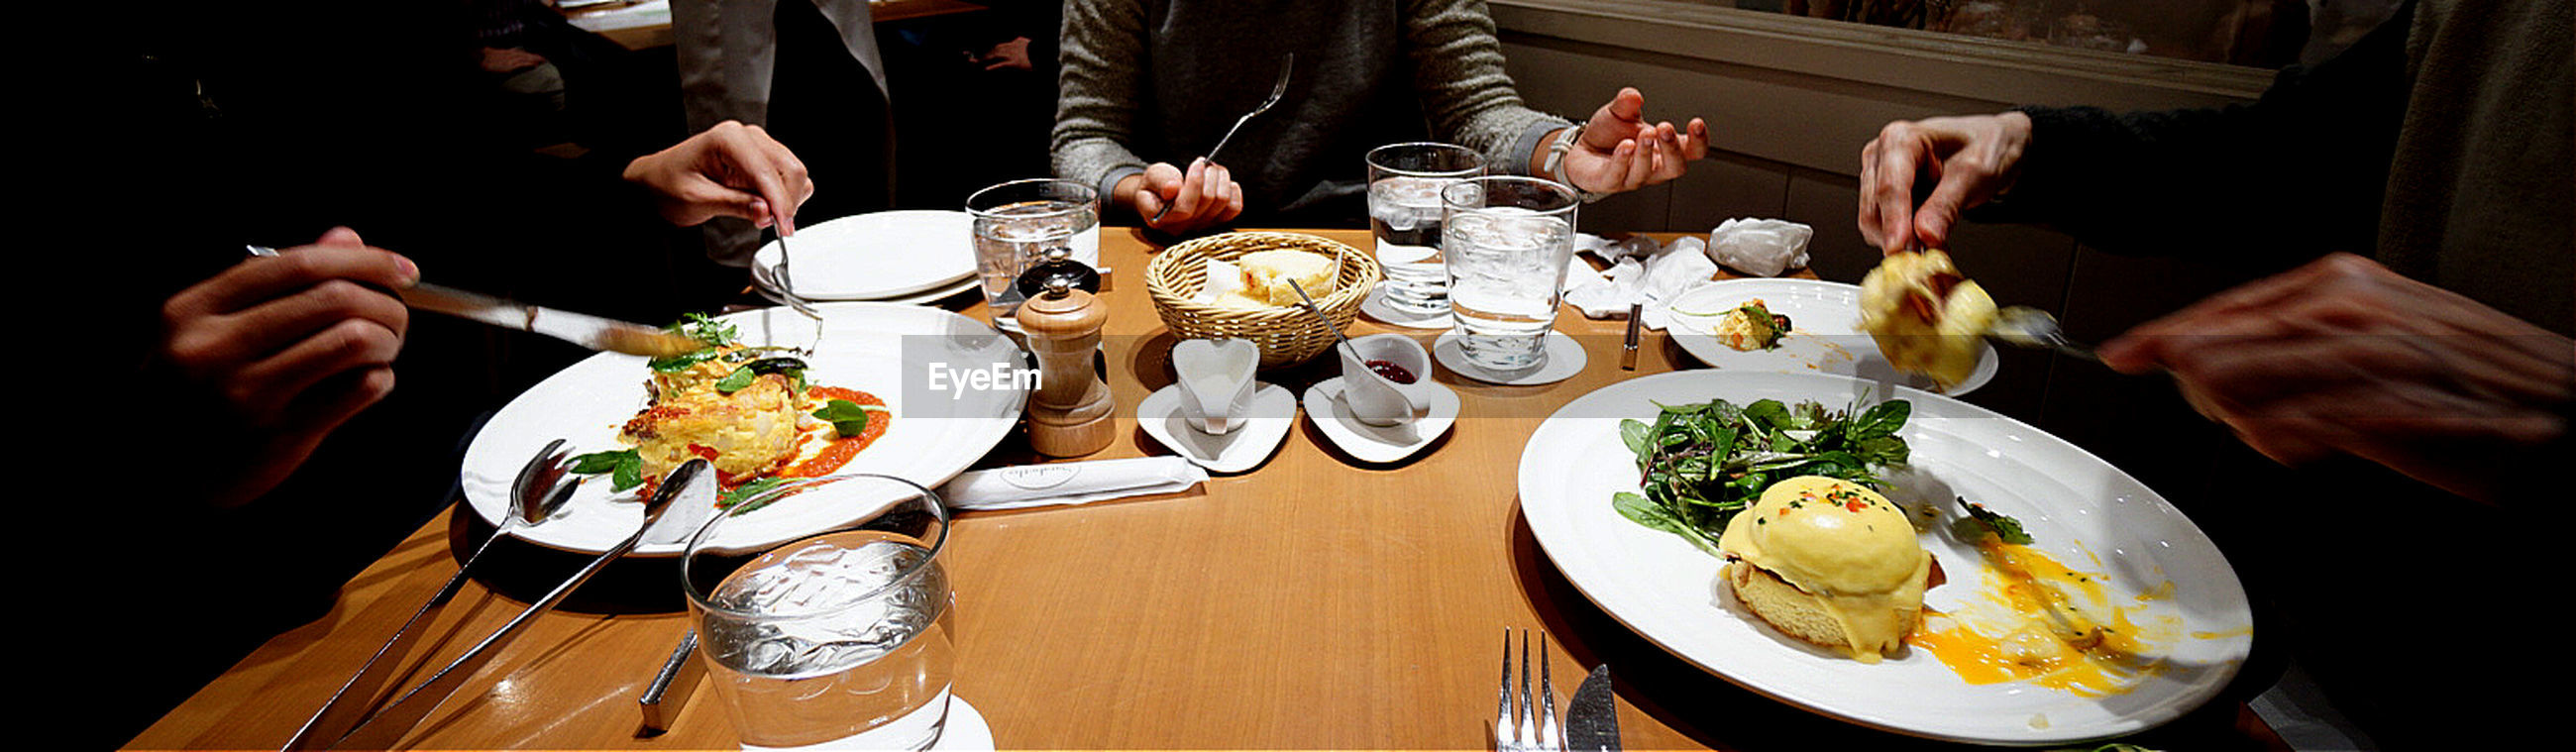 People having breakfast at restaurant table